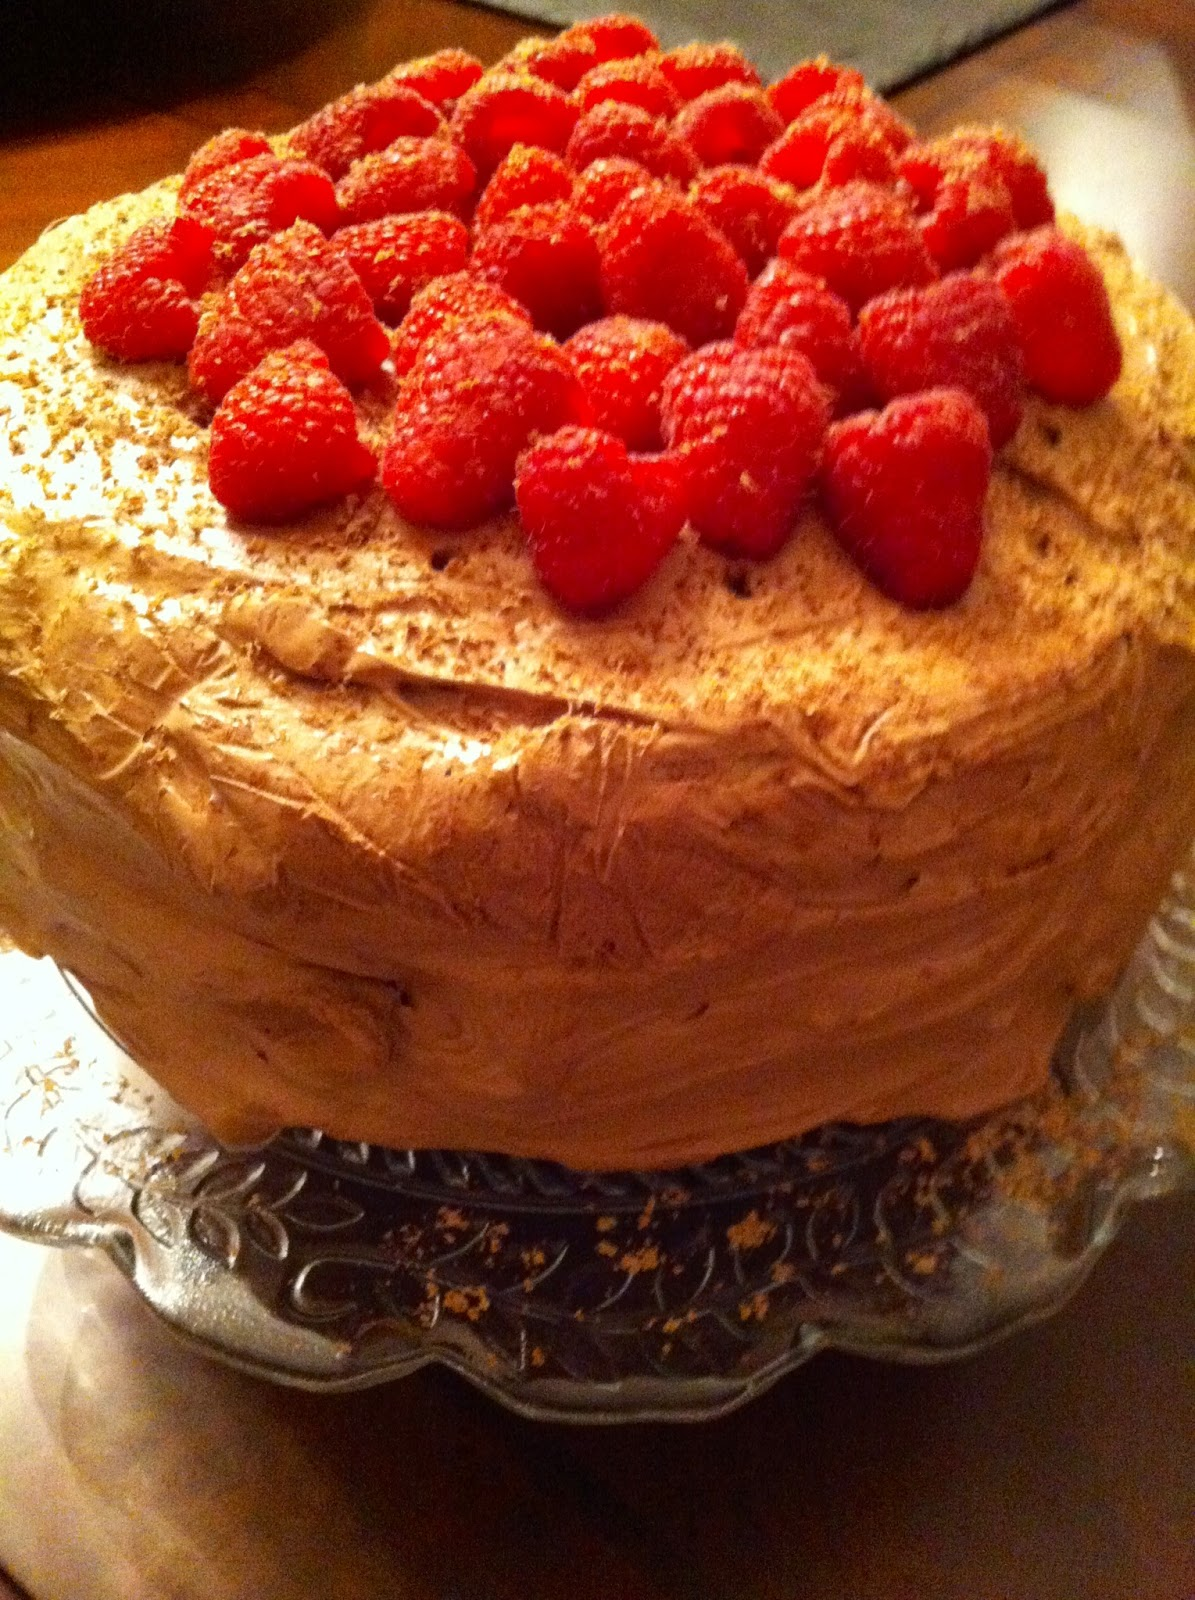 Kitty s kozy kitchen chocolate mocha cake with raspberry filling